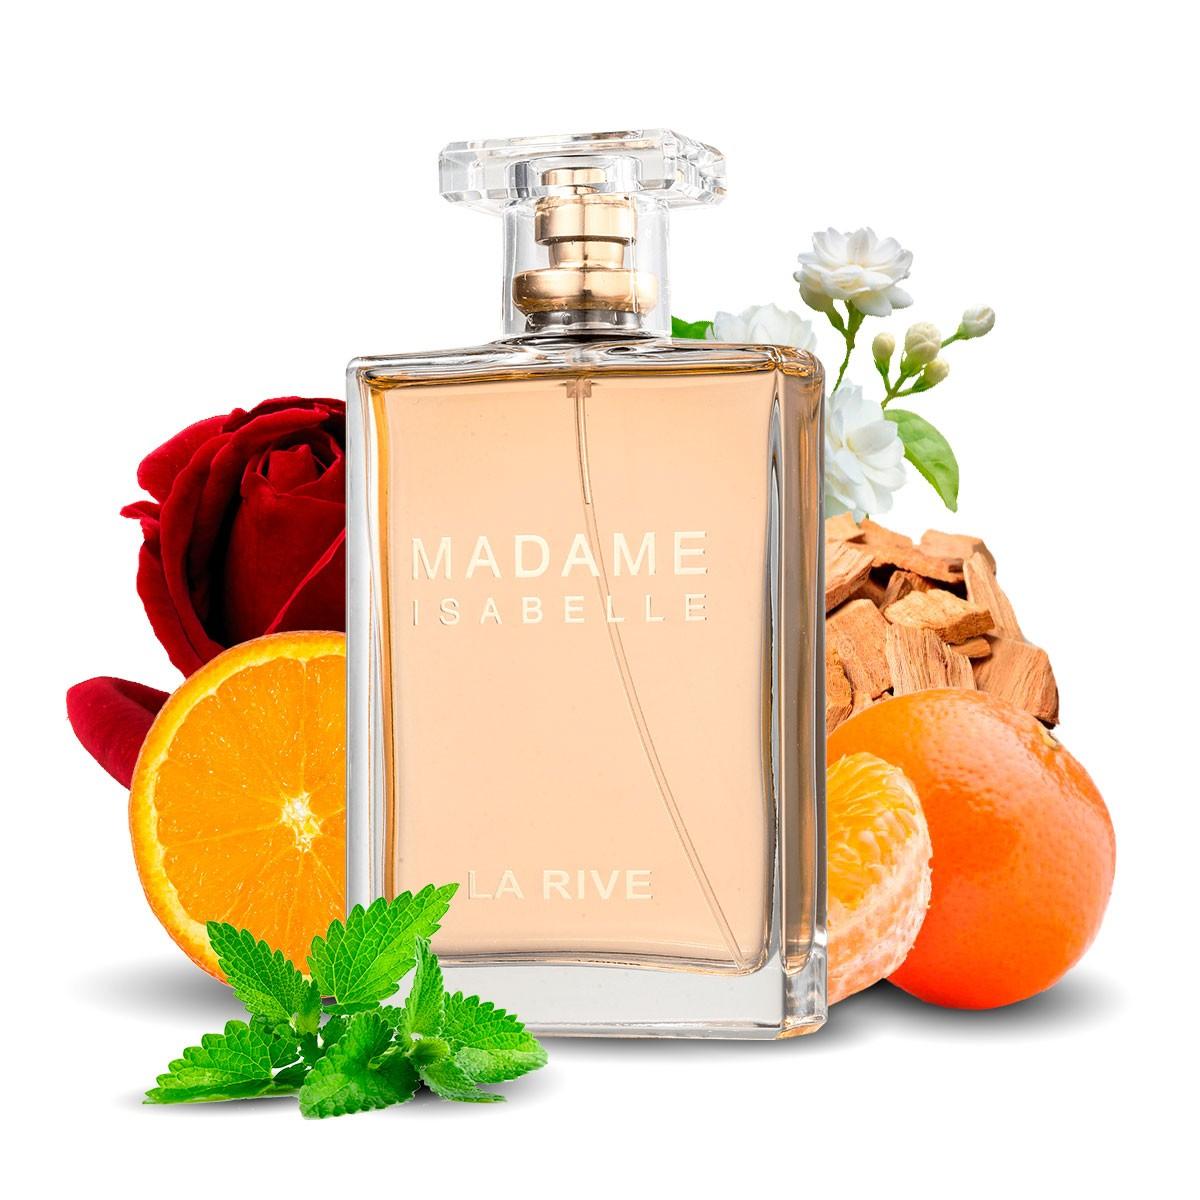 Kit 15 Perfumes Importados La Rive Atacado Mais Vendidos  - Mercari Perfumes